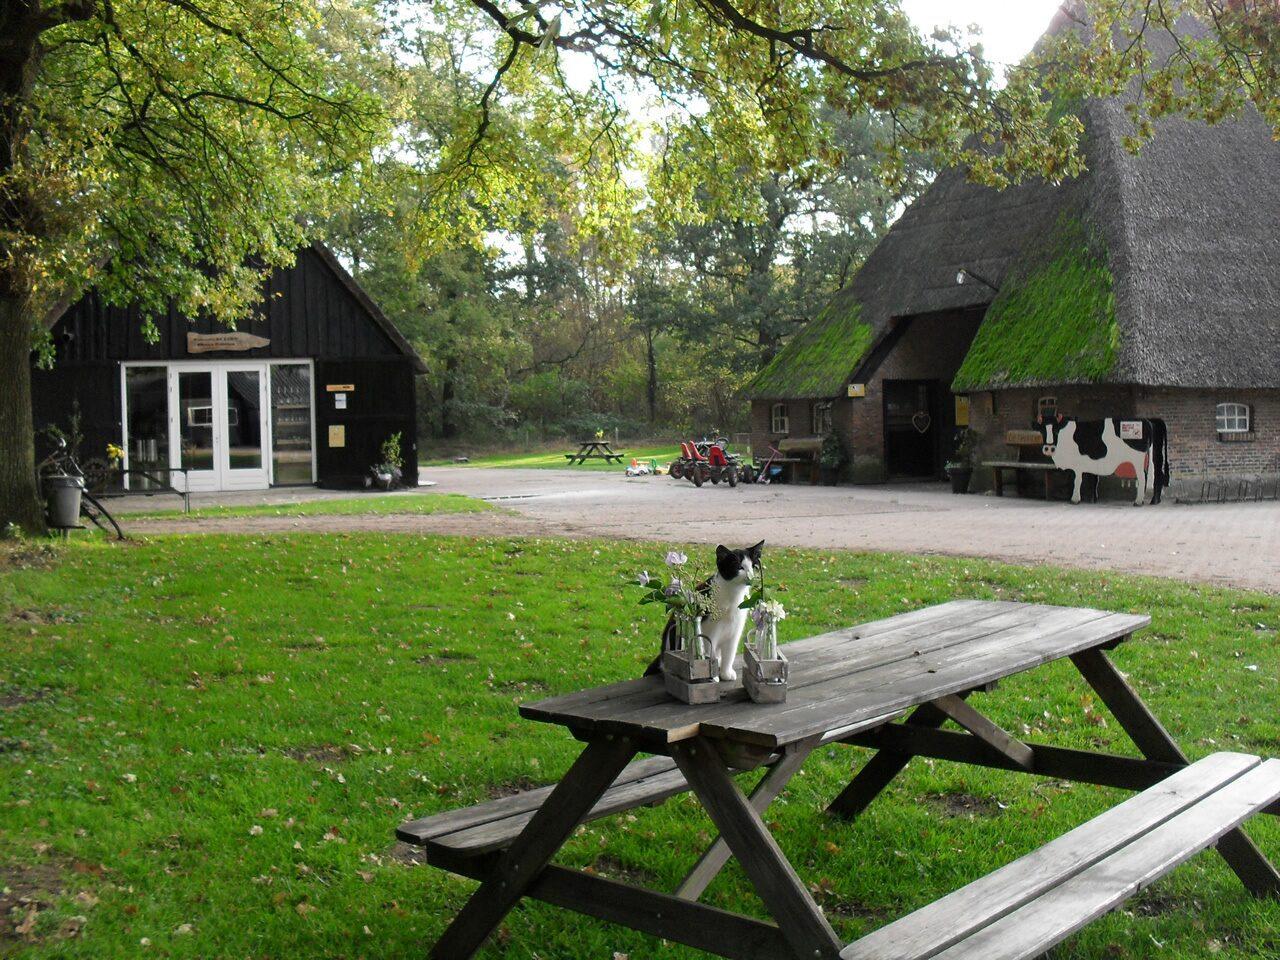 Meulenhorst-Bauernhof